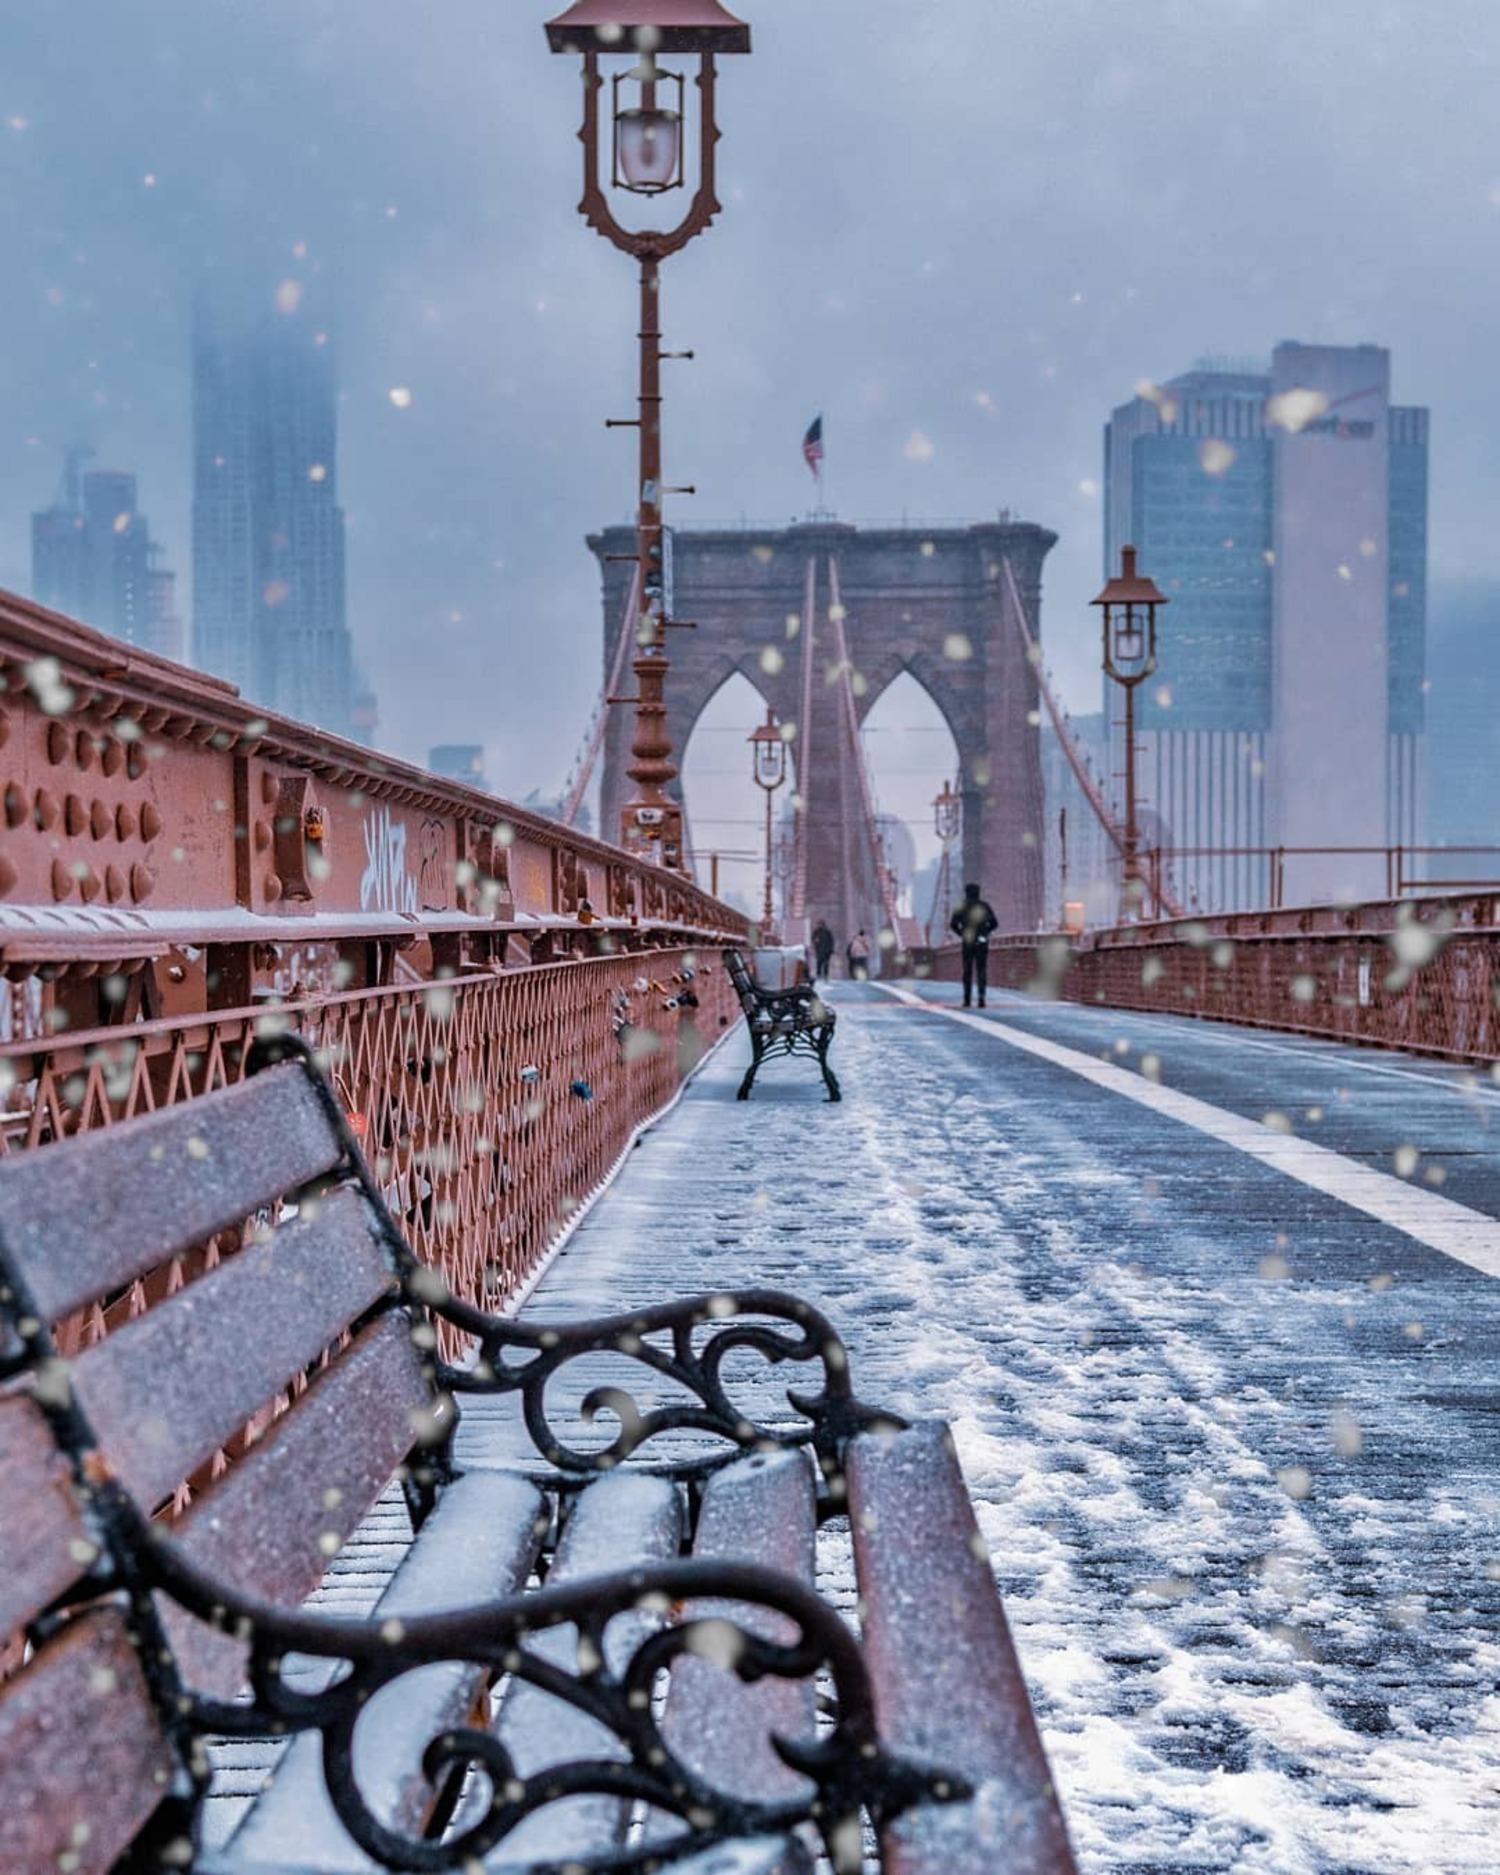 Snow on the Brooklyn Bridge